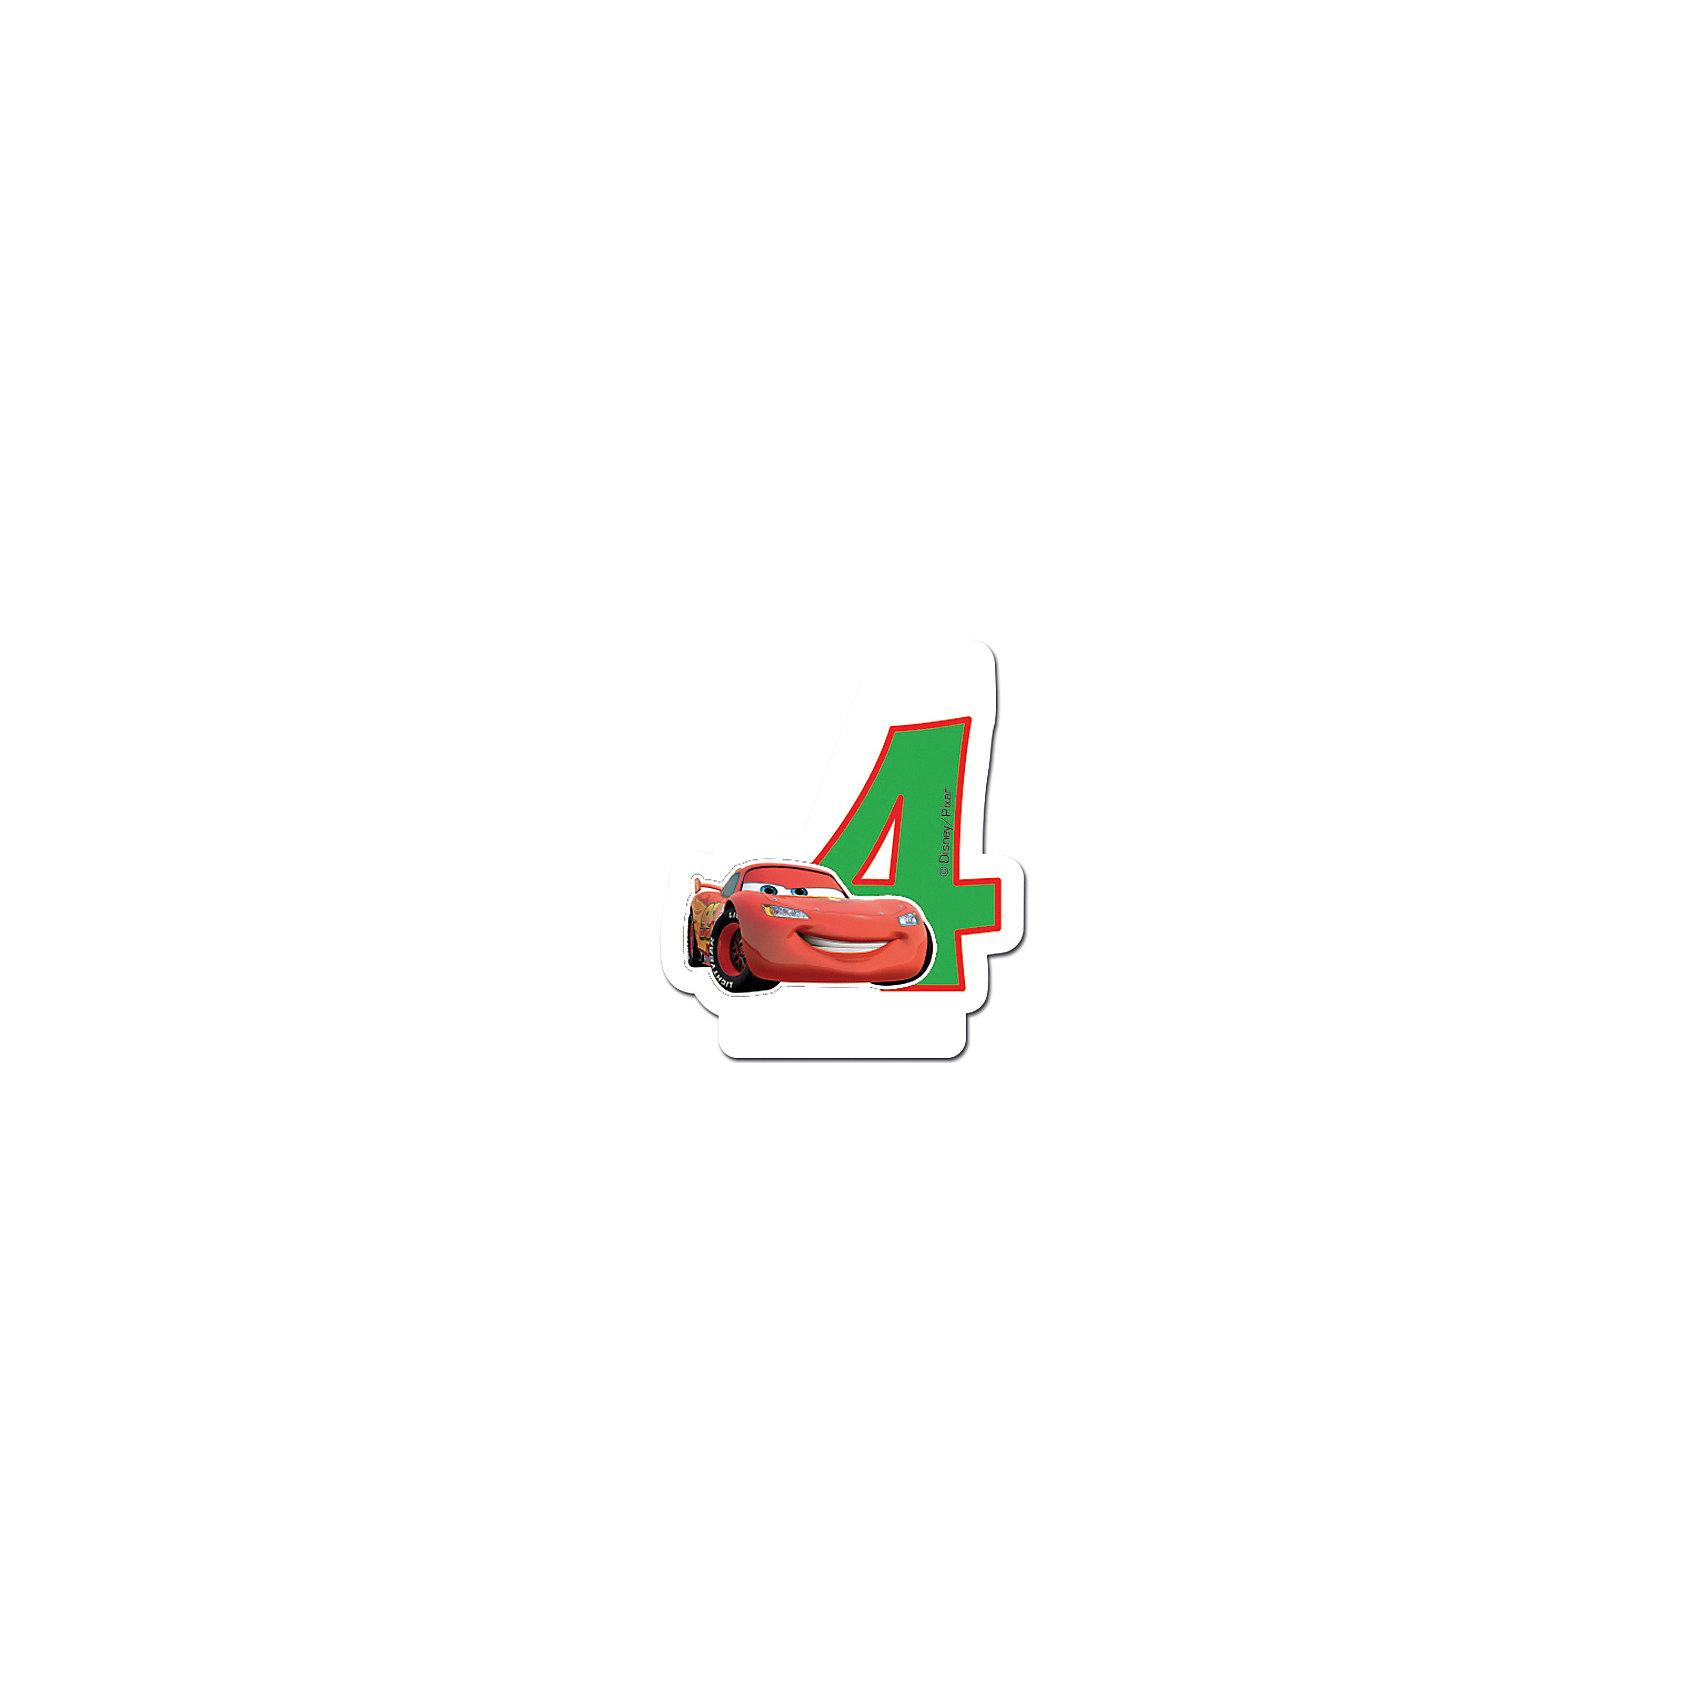 �������� ������ ����� 4 ������������ ������ ����� (Cars) ������� ����������� ���� ������ ������ �� ��� 4 -�����. ������ ��������� � ����� ����� 4 � �������� �������� ����� �� ����������� ������������ ����������� �����. ����� ������������ ������ ������� ������� ��������� ��������� � ��� �� ������� ������� ���������.<br><br>�������������� ����������:<br><br>- ��������: �������. <br>- ������: 2,6 � 8,8 � 13 ��.<br>- ���: 150 ��. <br><br>�������� ������ ����� 4 ����,  ����� ������ � ����� ��������-��������.<br><br>������ ��: 26<br>������� ��: 88<br>������ ��: 130<br>��� �: 150<br>������� �� �������: 36<br>������� �� �������: 168<br>���: �������<br>�������: �������